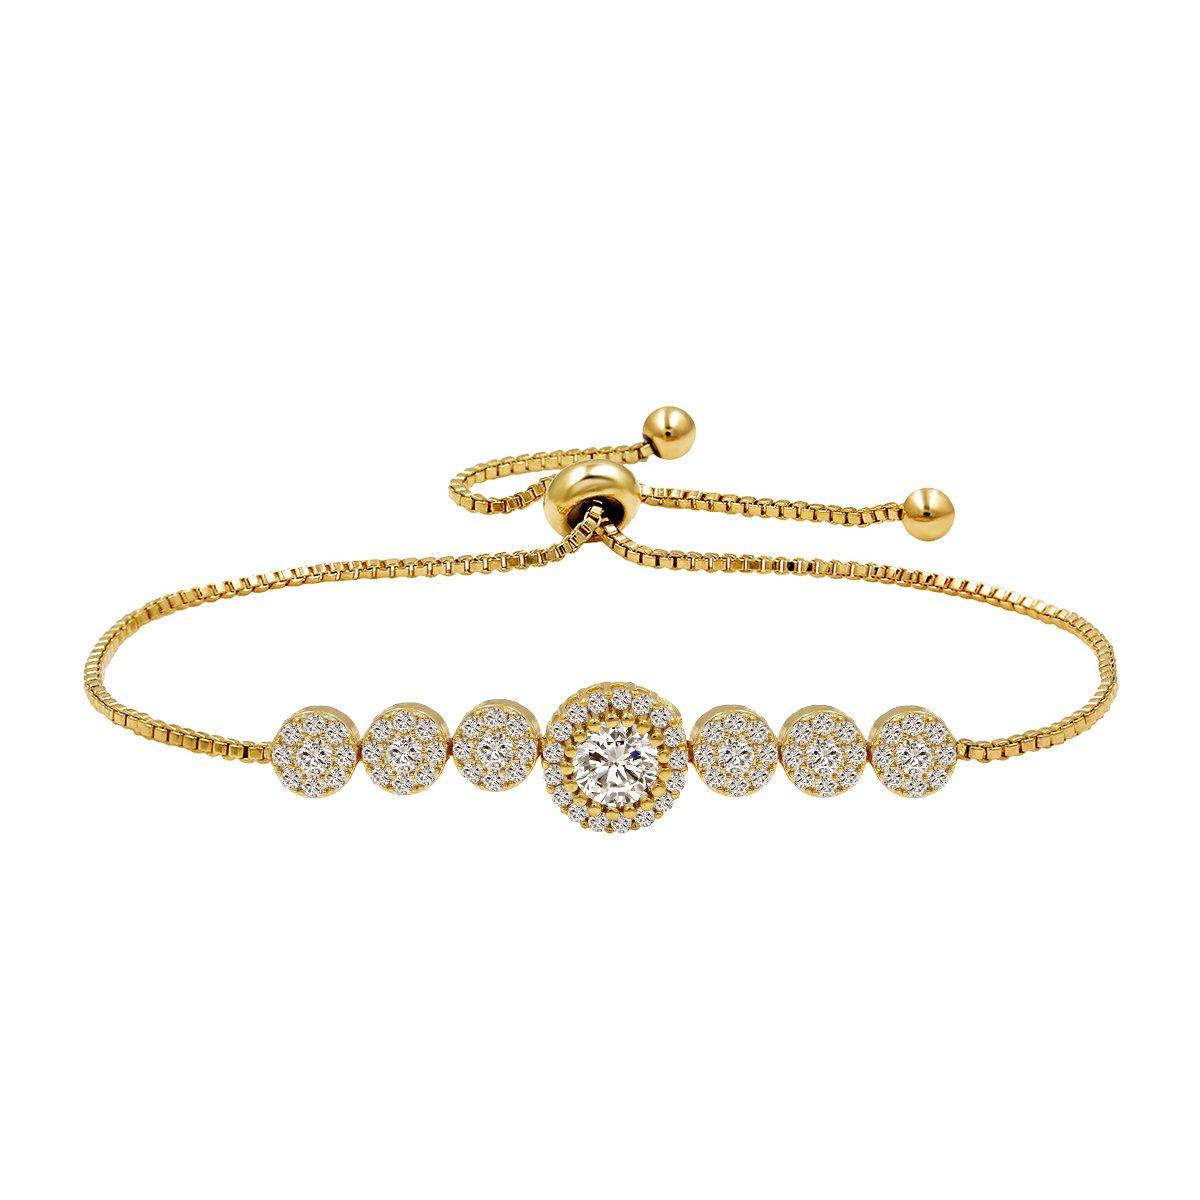 WeimanJewelry Round Cut CZ Cubic Zirconia Crystal Bridal Adjustable Chain Bracelet for Women (Gold)